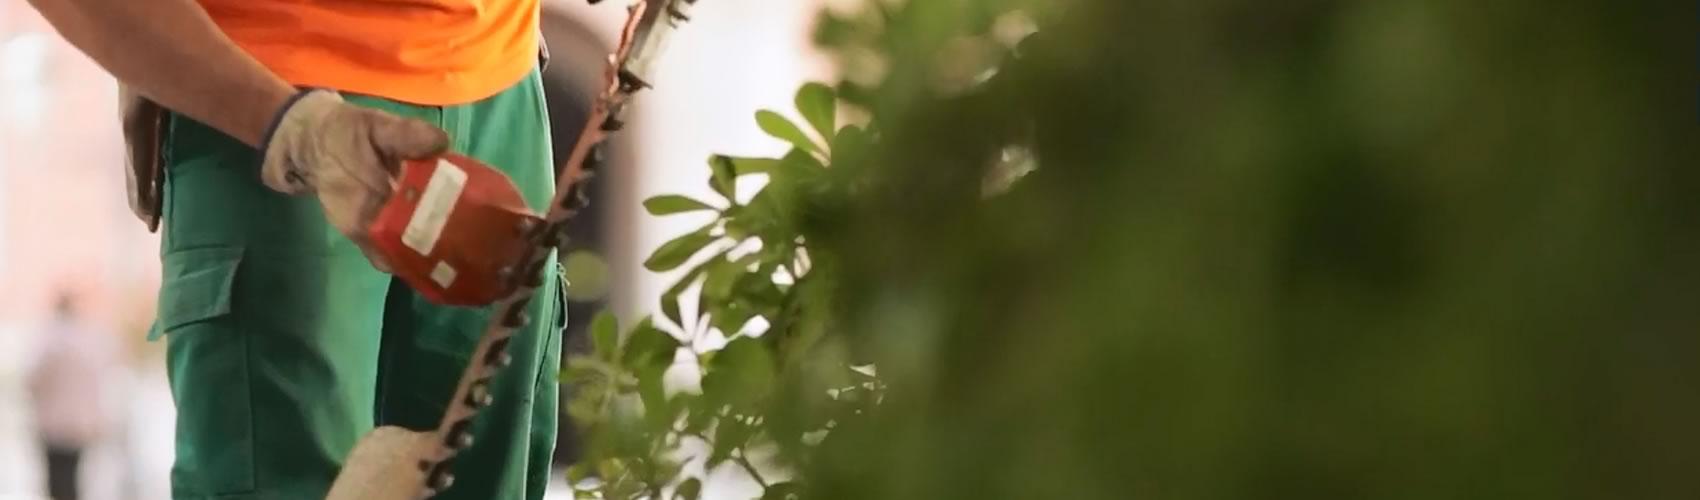 sav-agricultores-de-la-vega-0006